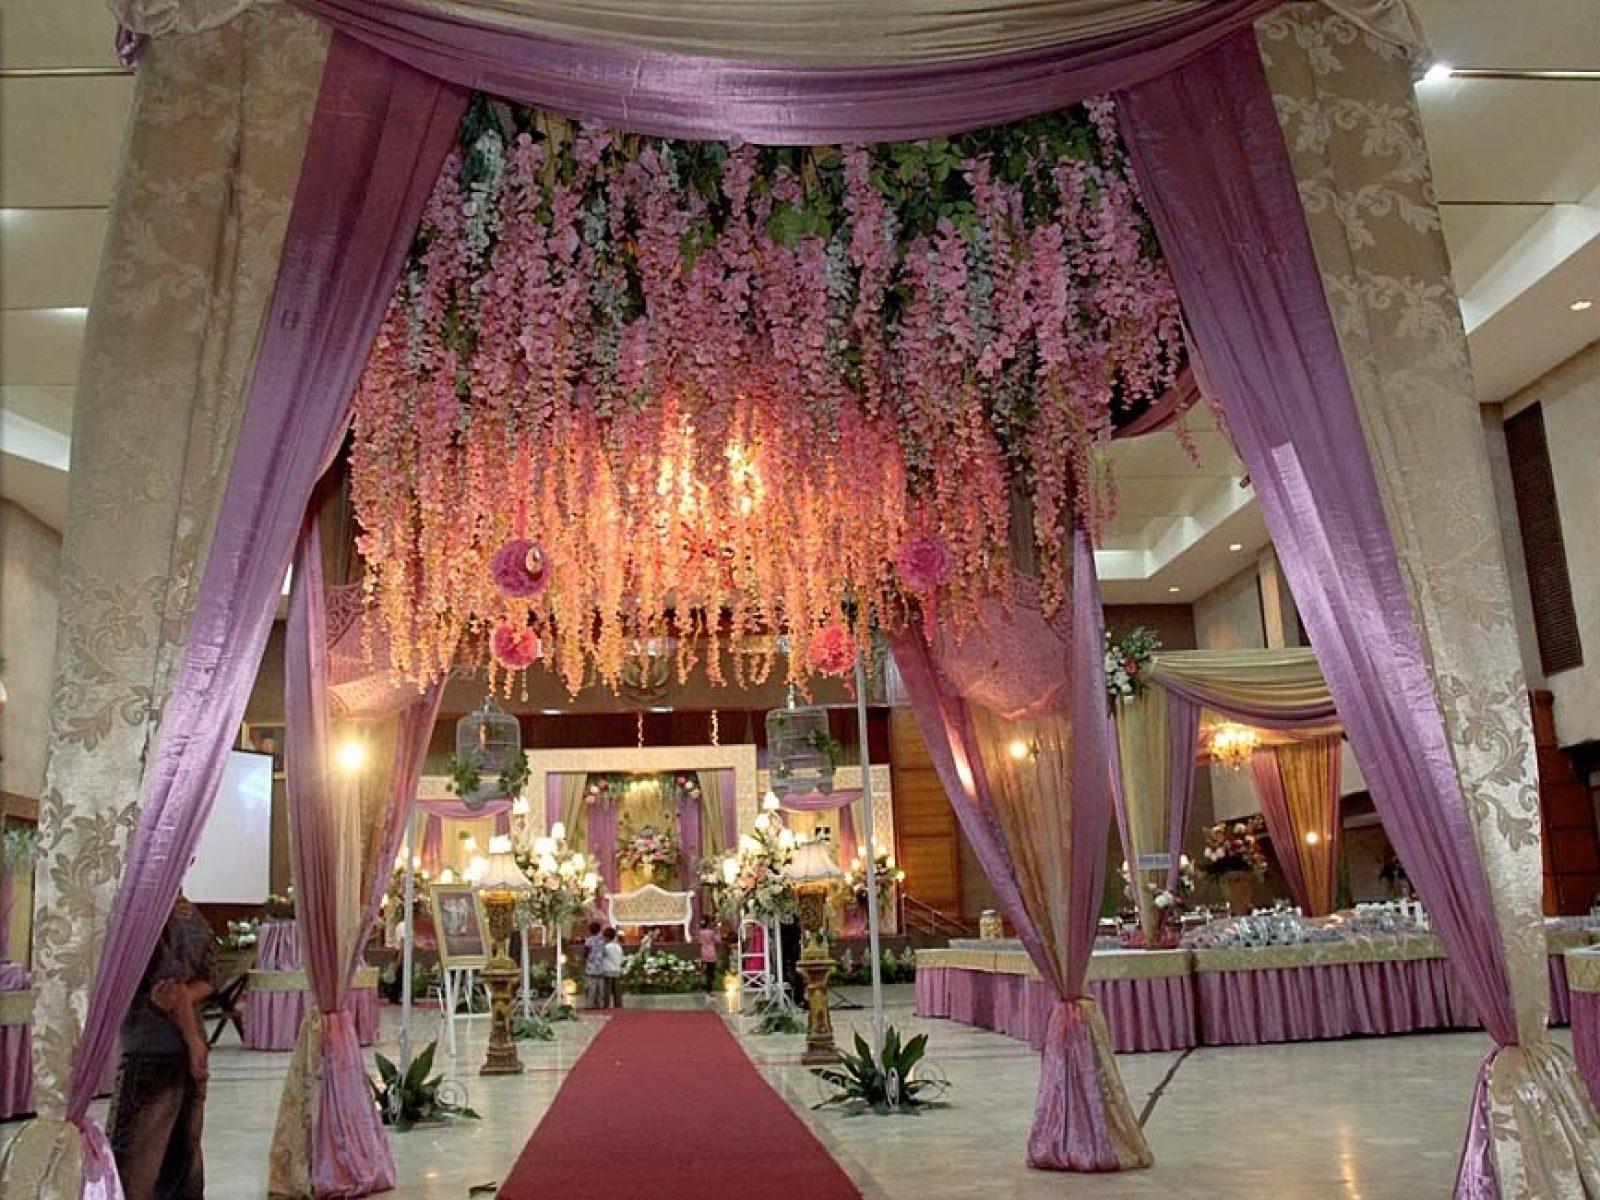 Gazebo, pergola, photo spot dan lain-lain adalah detail dekorasi yang juga kami sediakan untuk mempercantik dekorasi pernikahanmu.